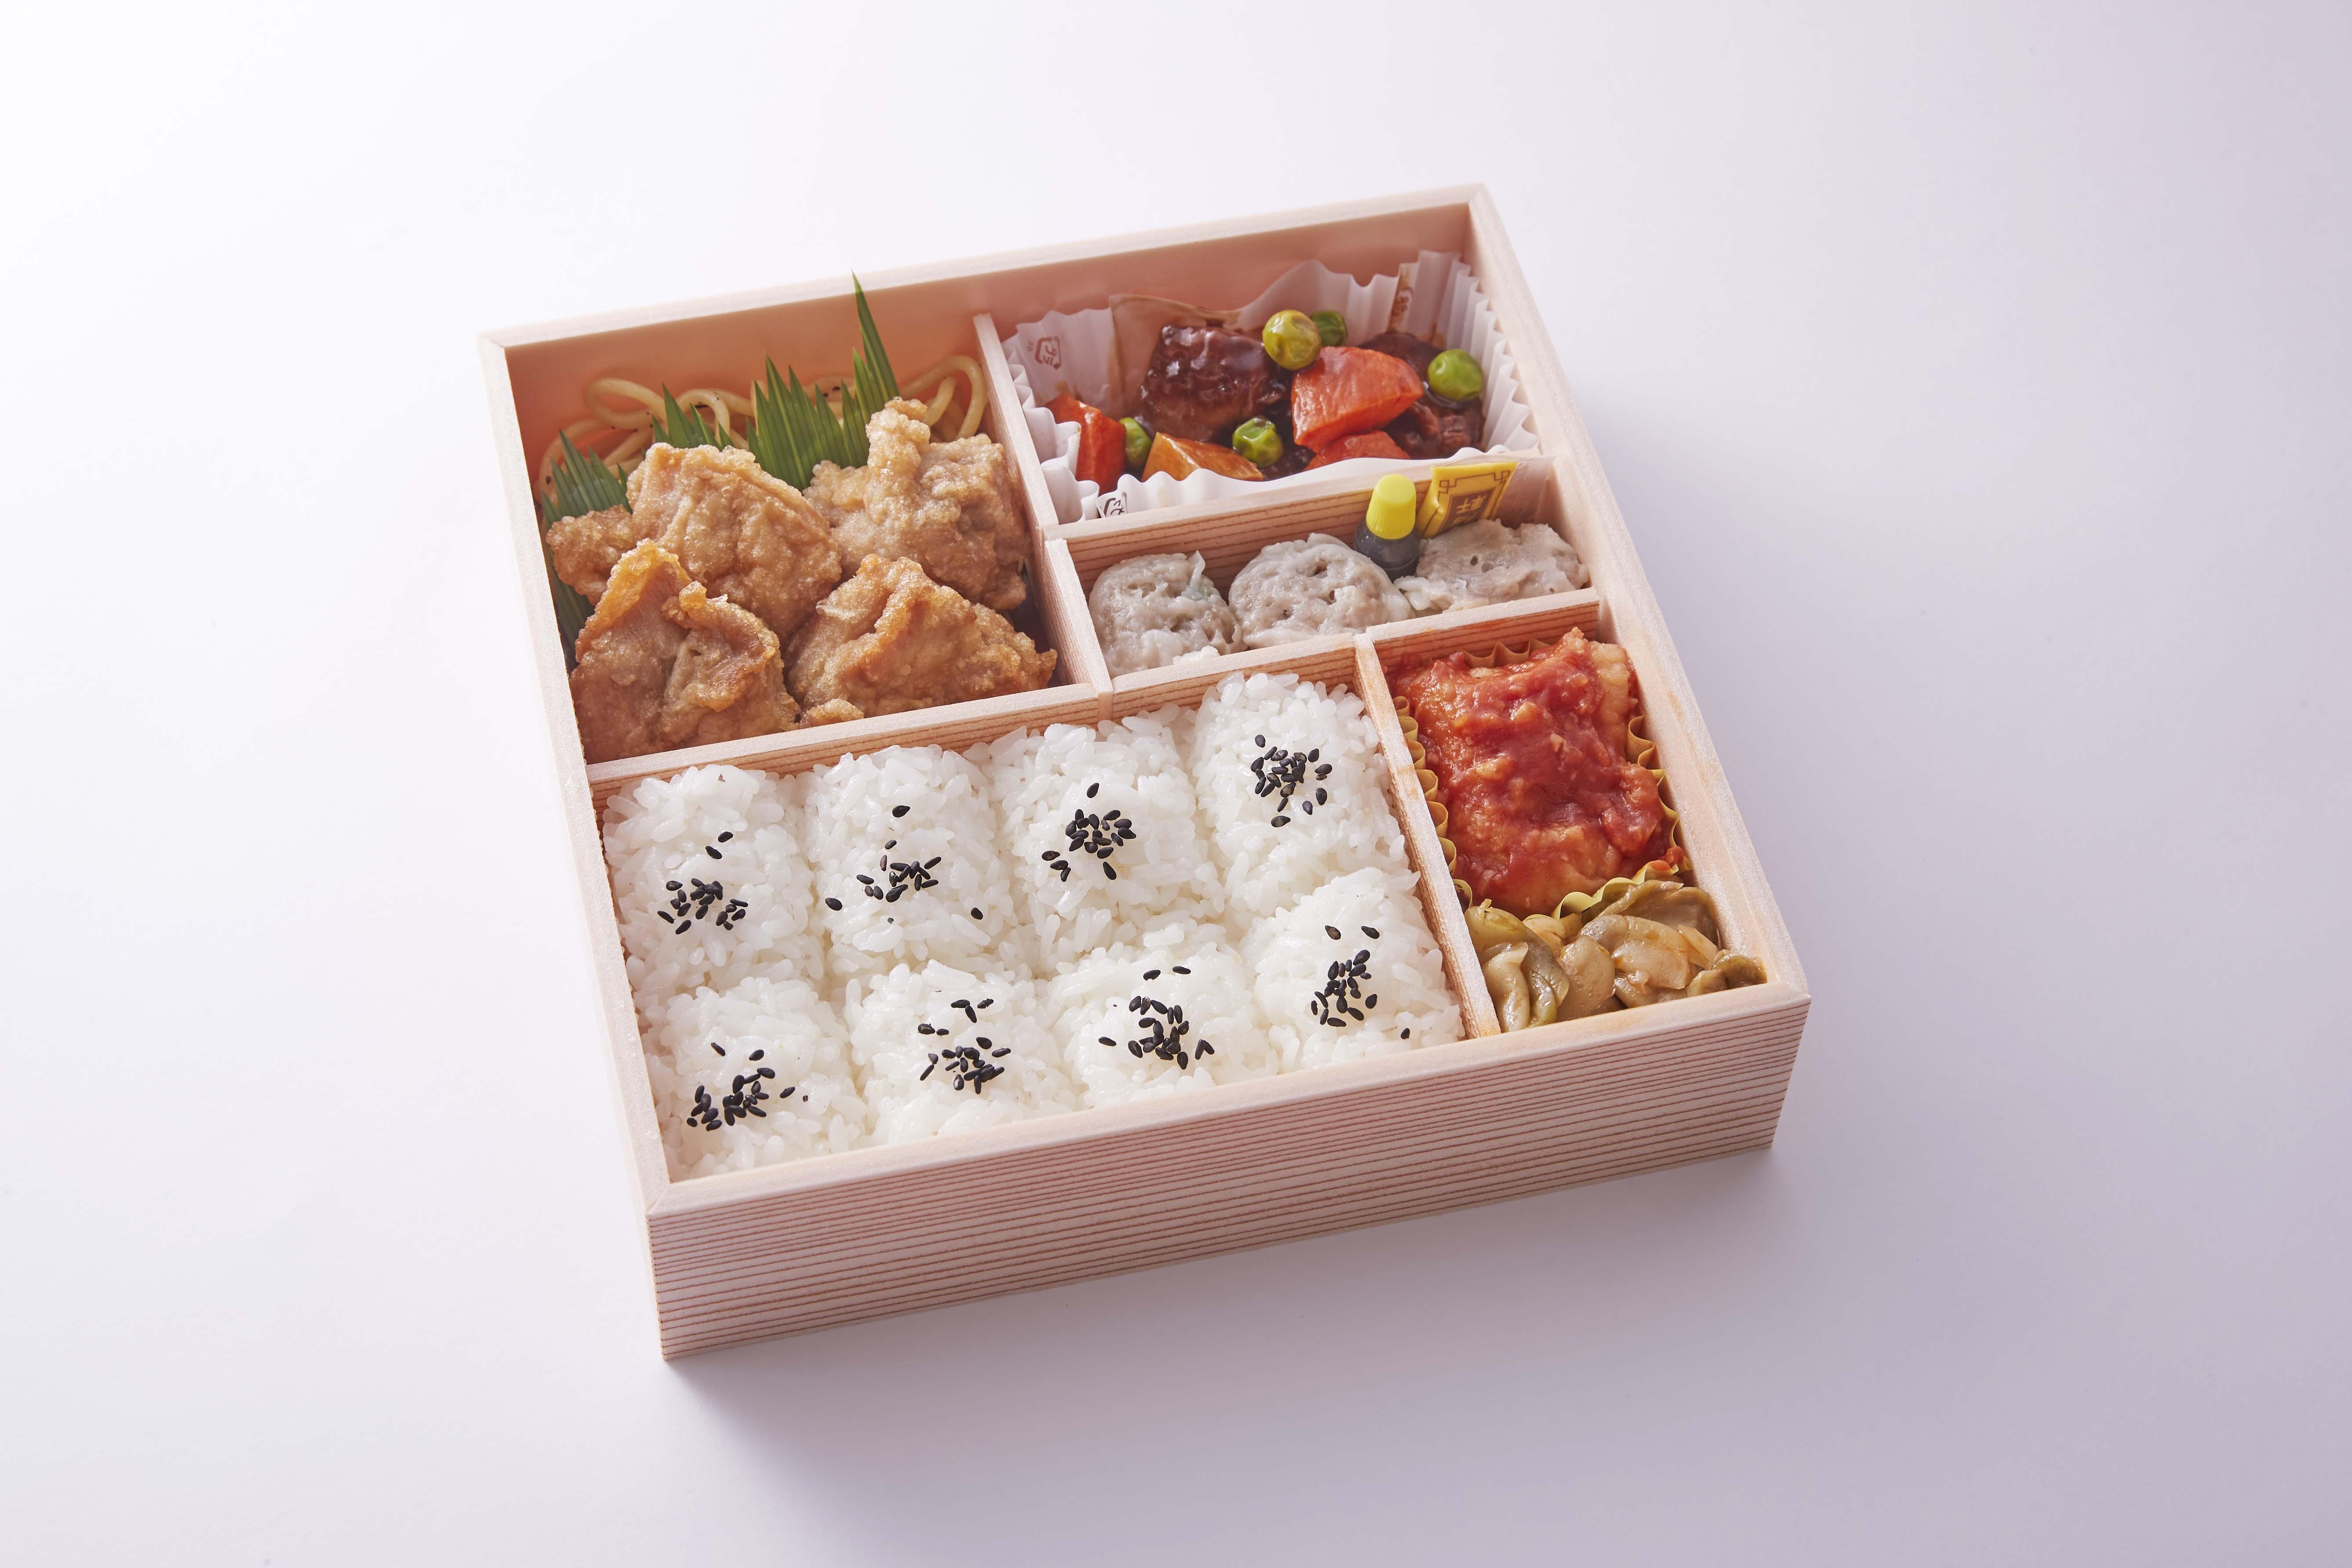 Foods & Shop - 崎陽軒 中華銘菜弁当